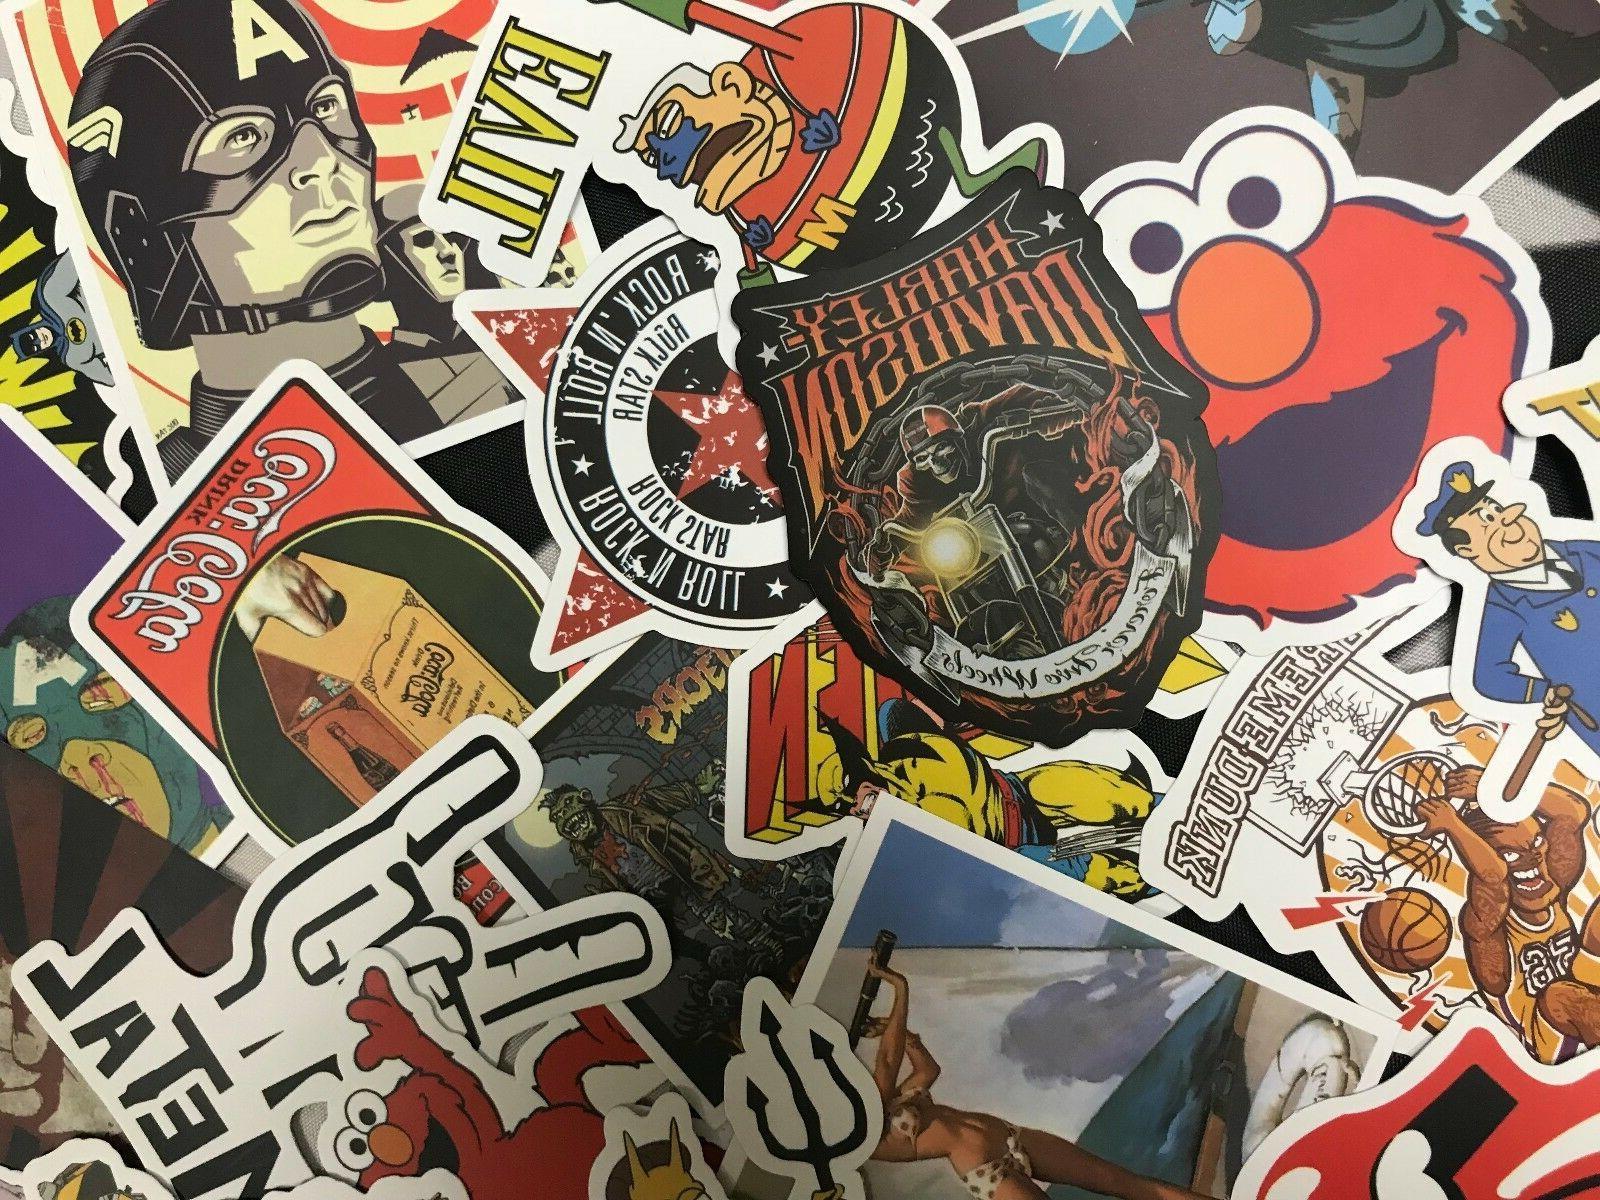 300 pcs / Sticker Decal Roll Car Skate Laptop